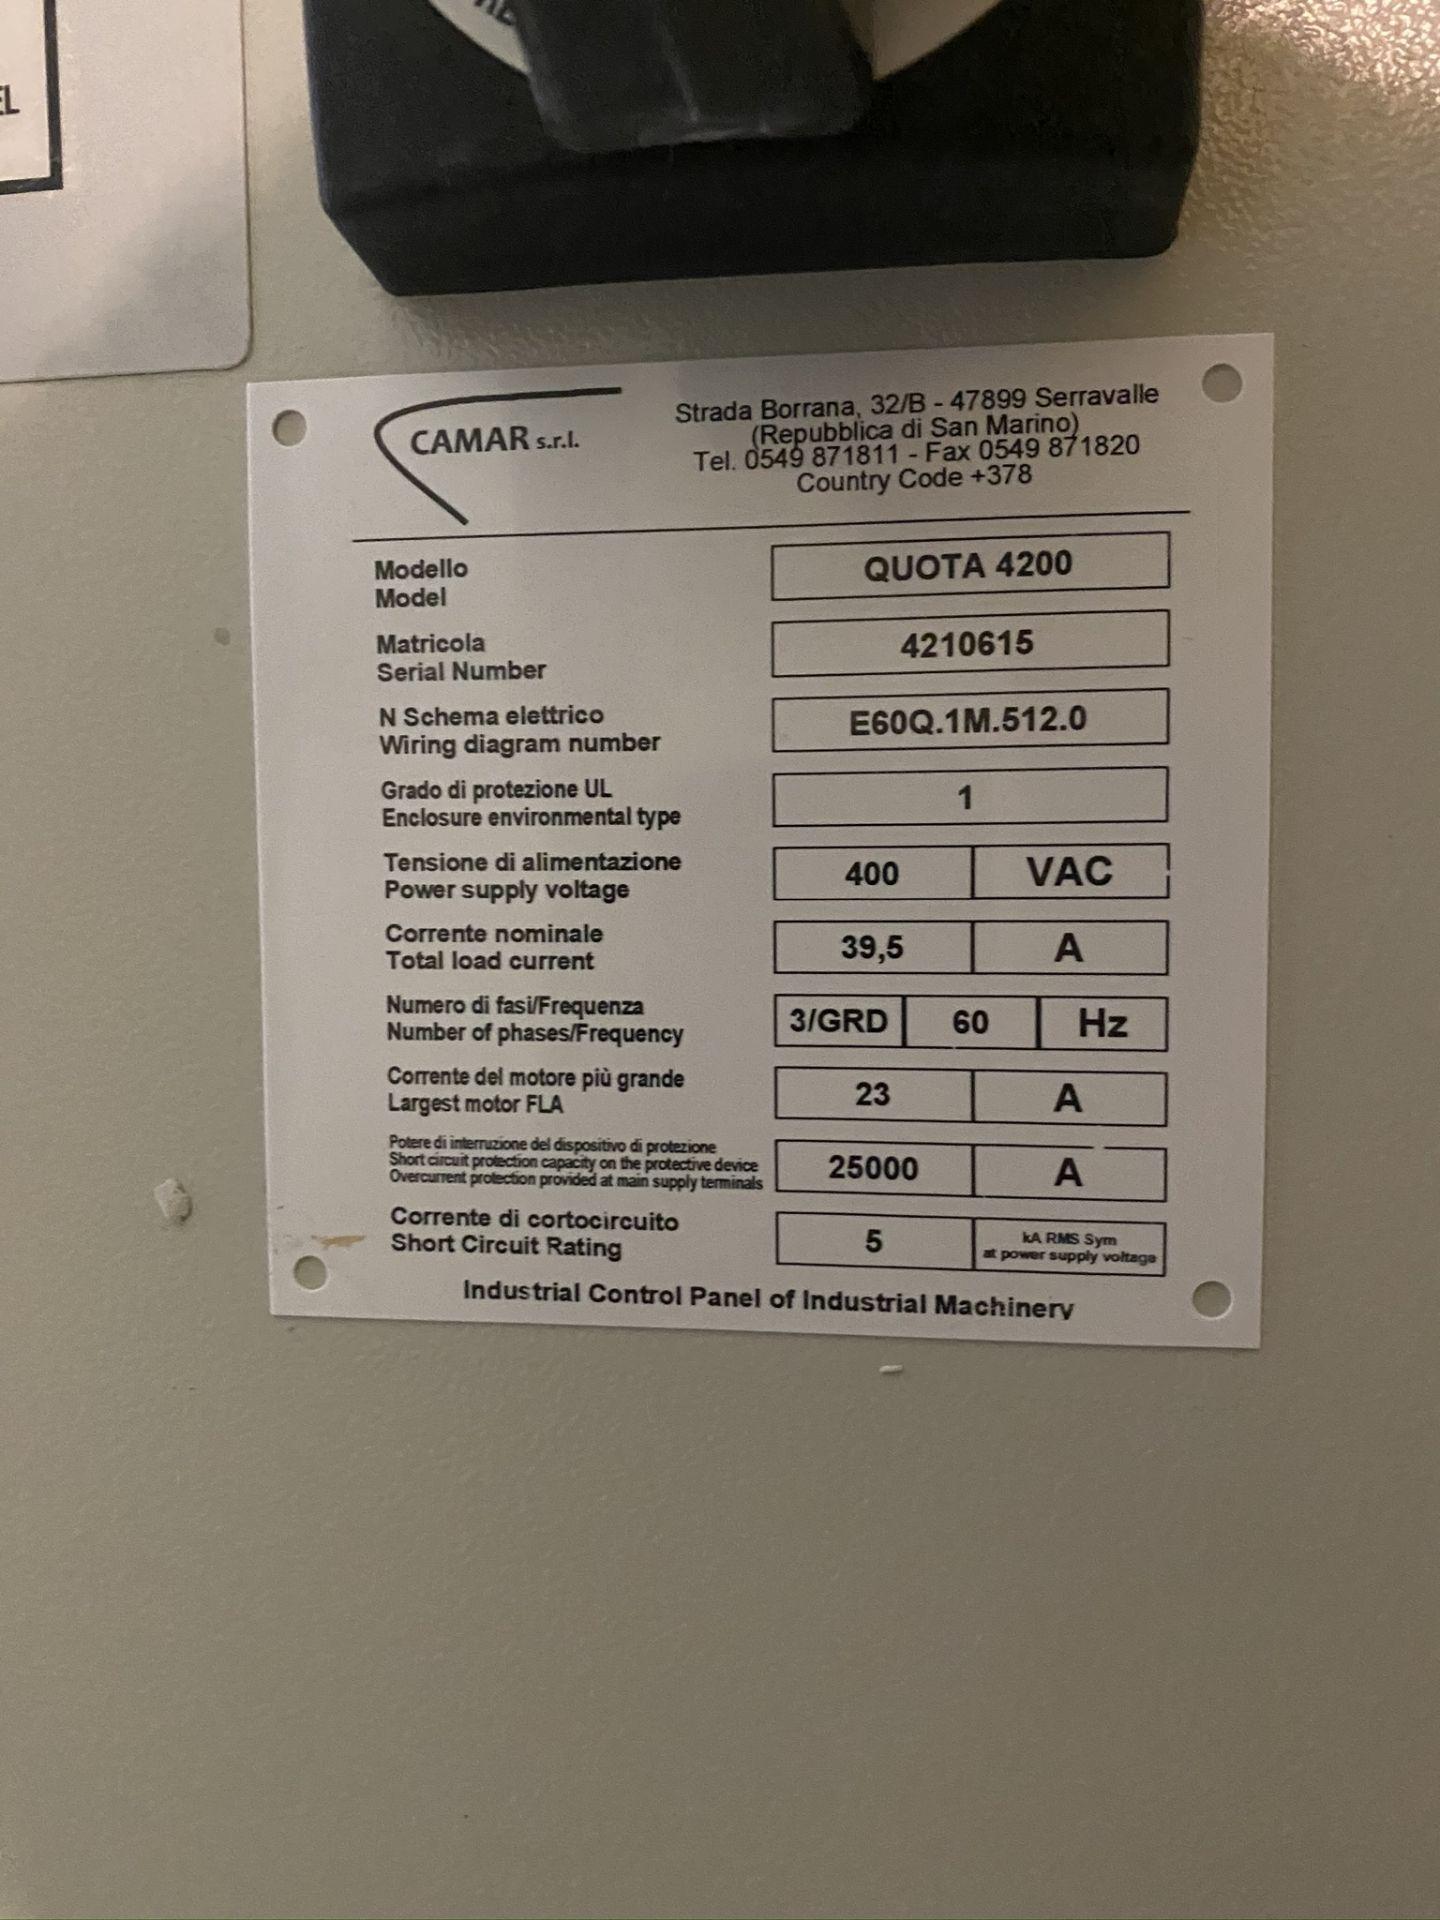 Lot 227 - DENVER, QUOTE 4200, CNC STONE MACHINING CENTRE, S/N 4210615